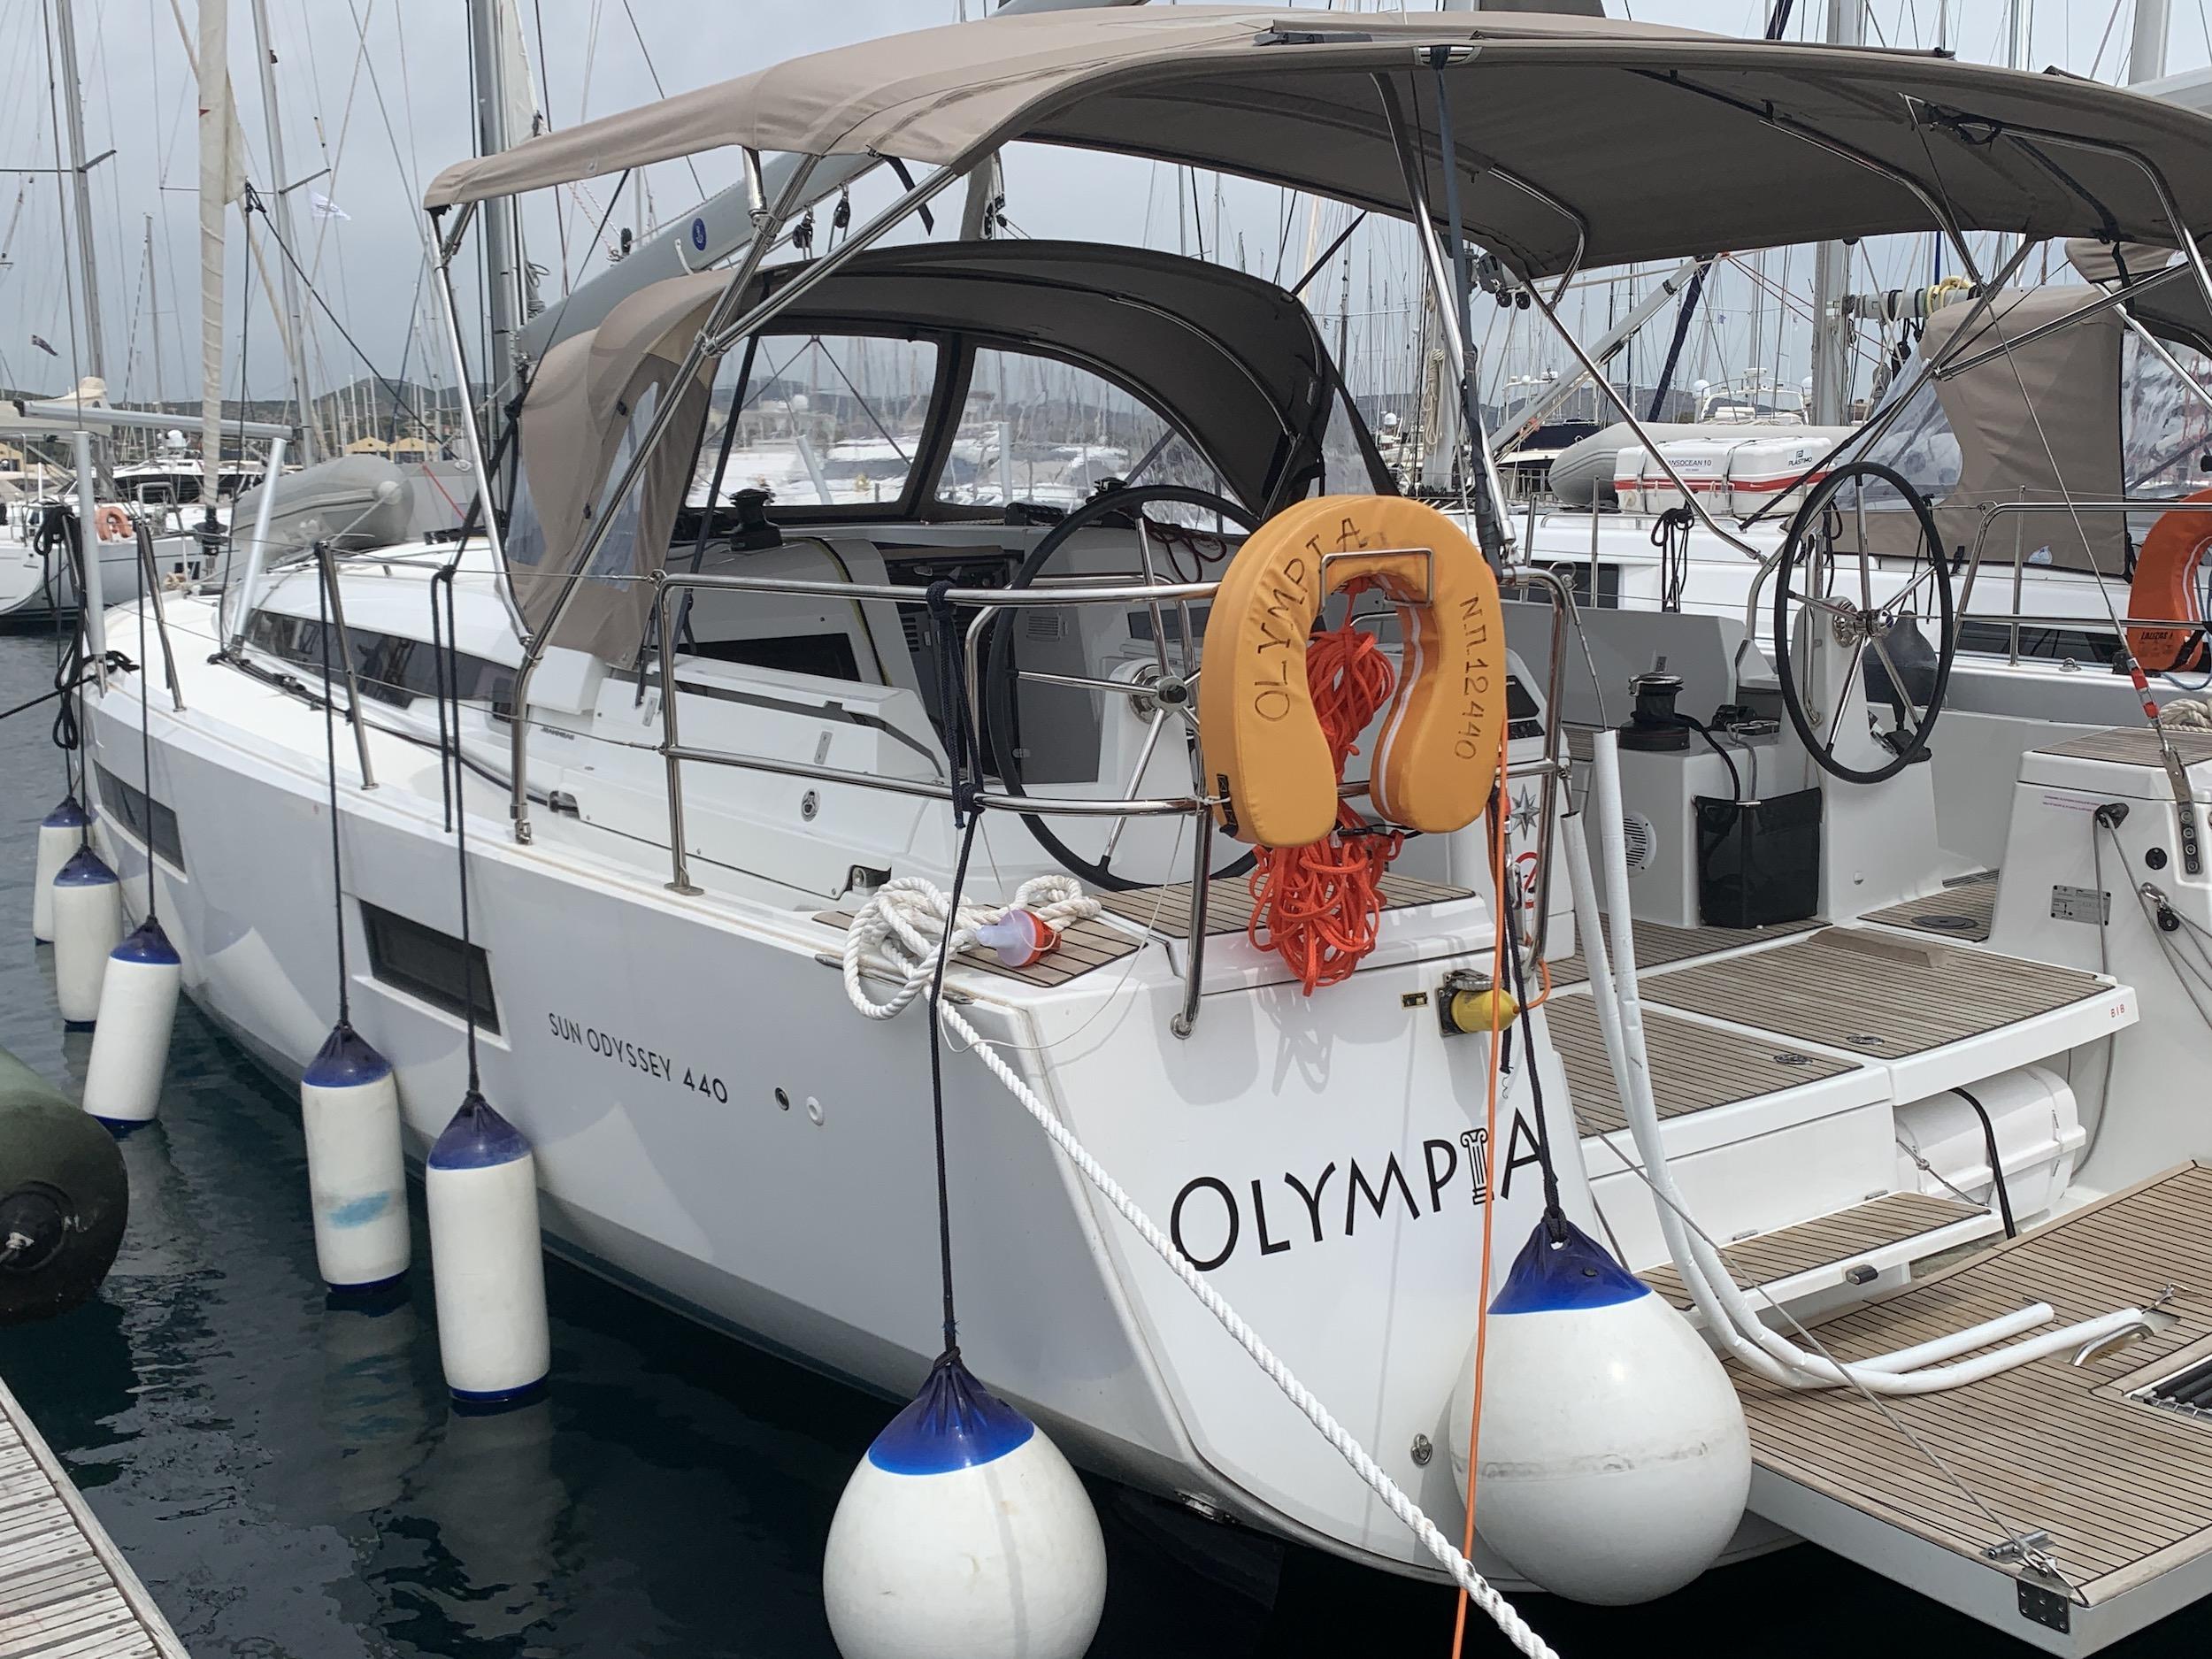 Sun Odyssey 440 (Olympia)  - 9